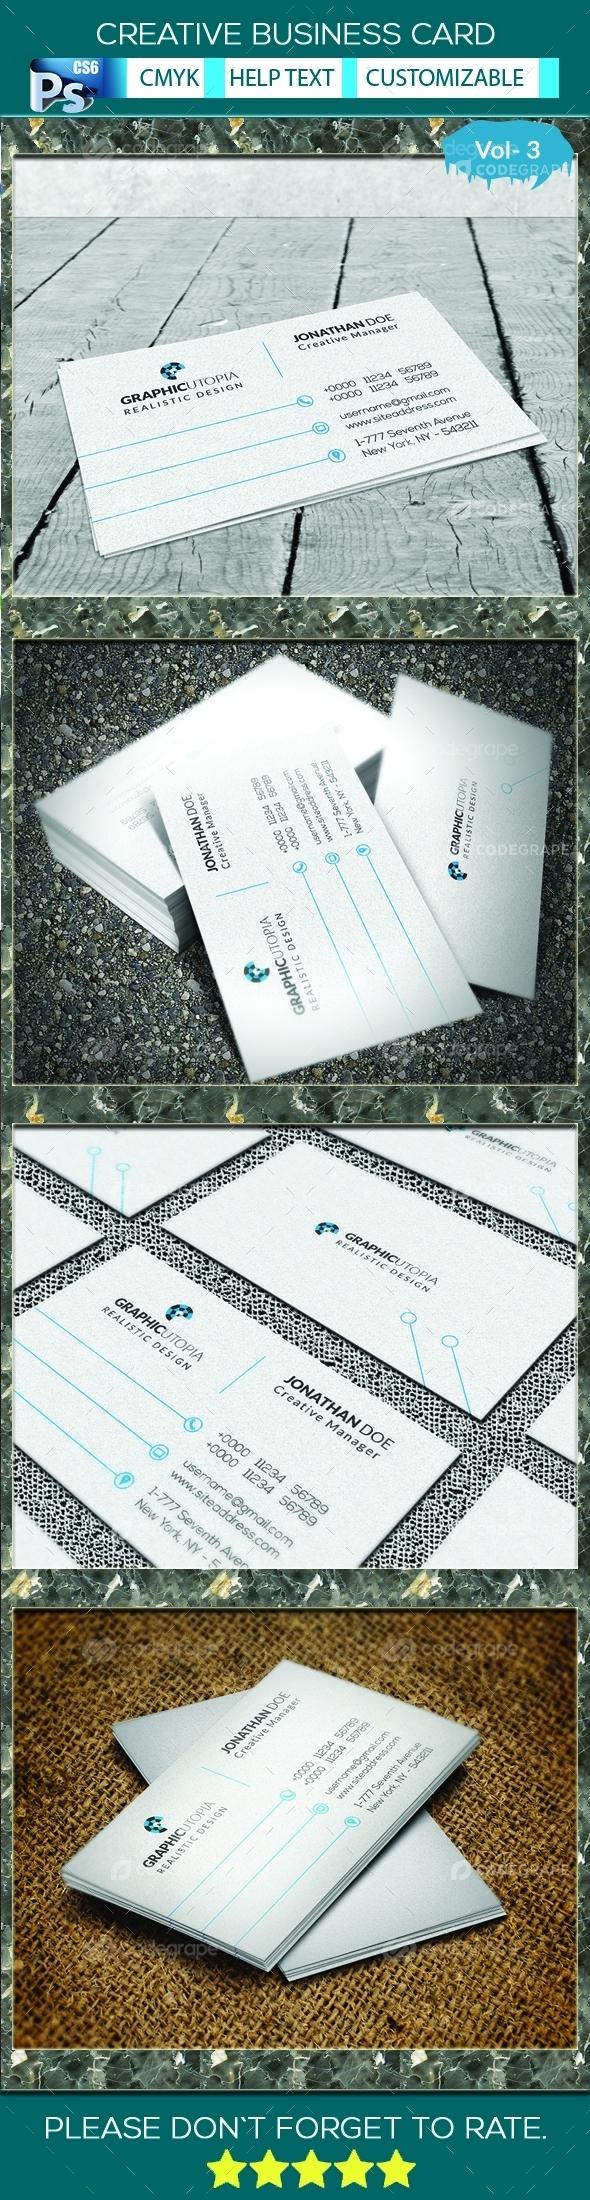 Creative Business Card vol 3